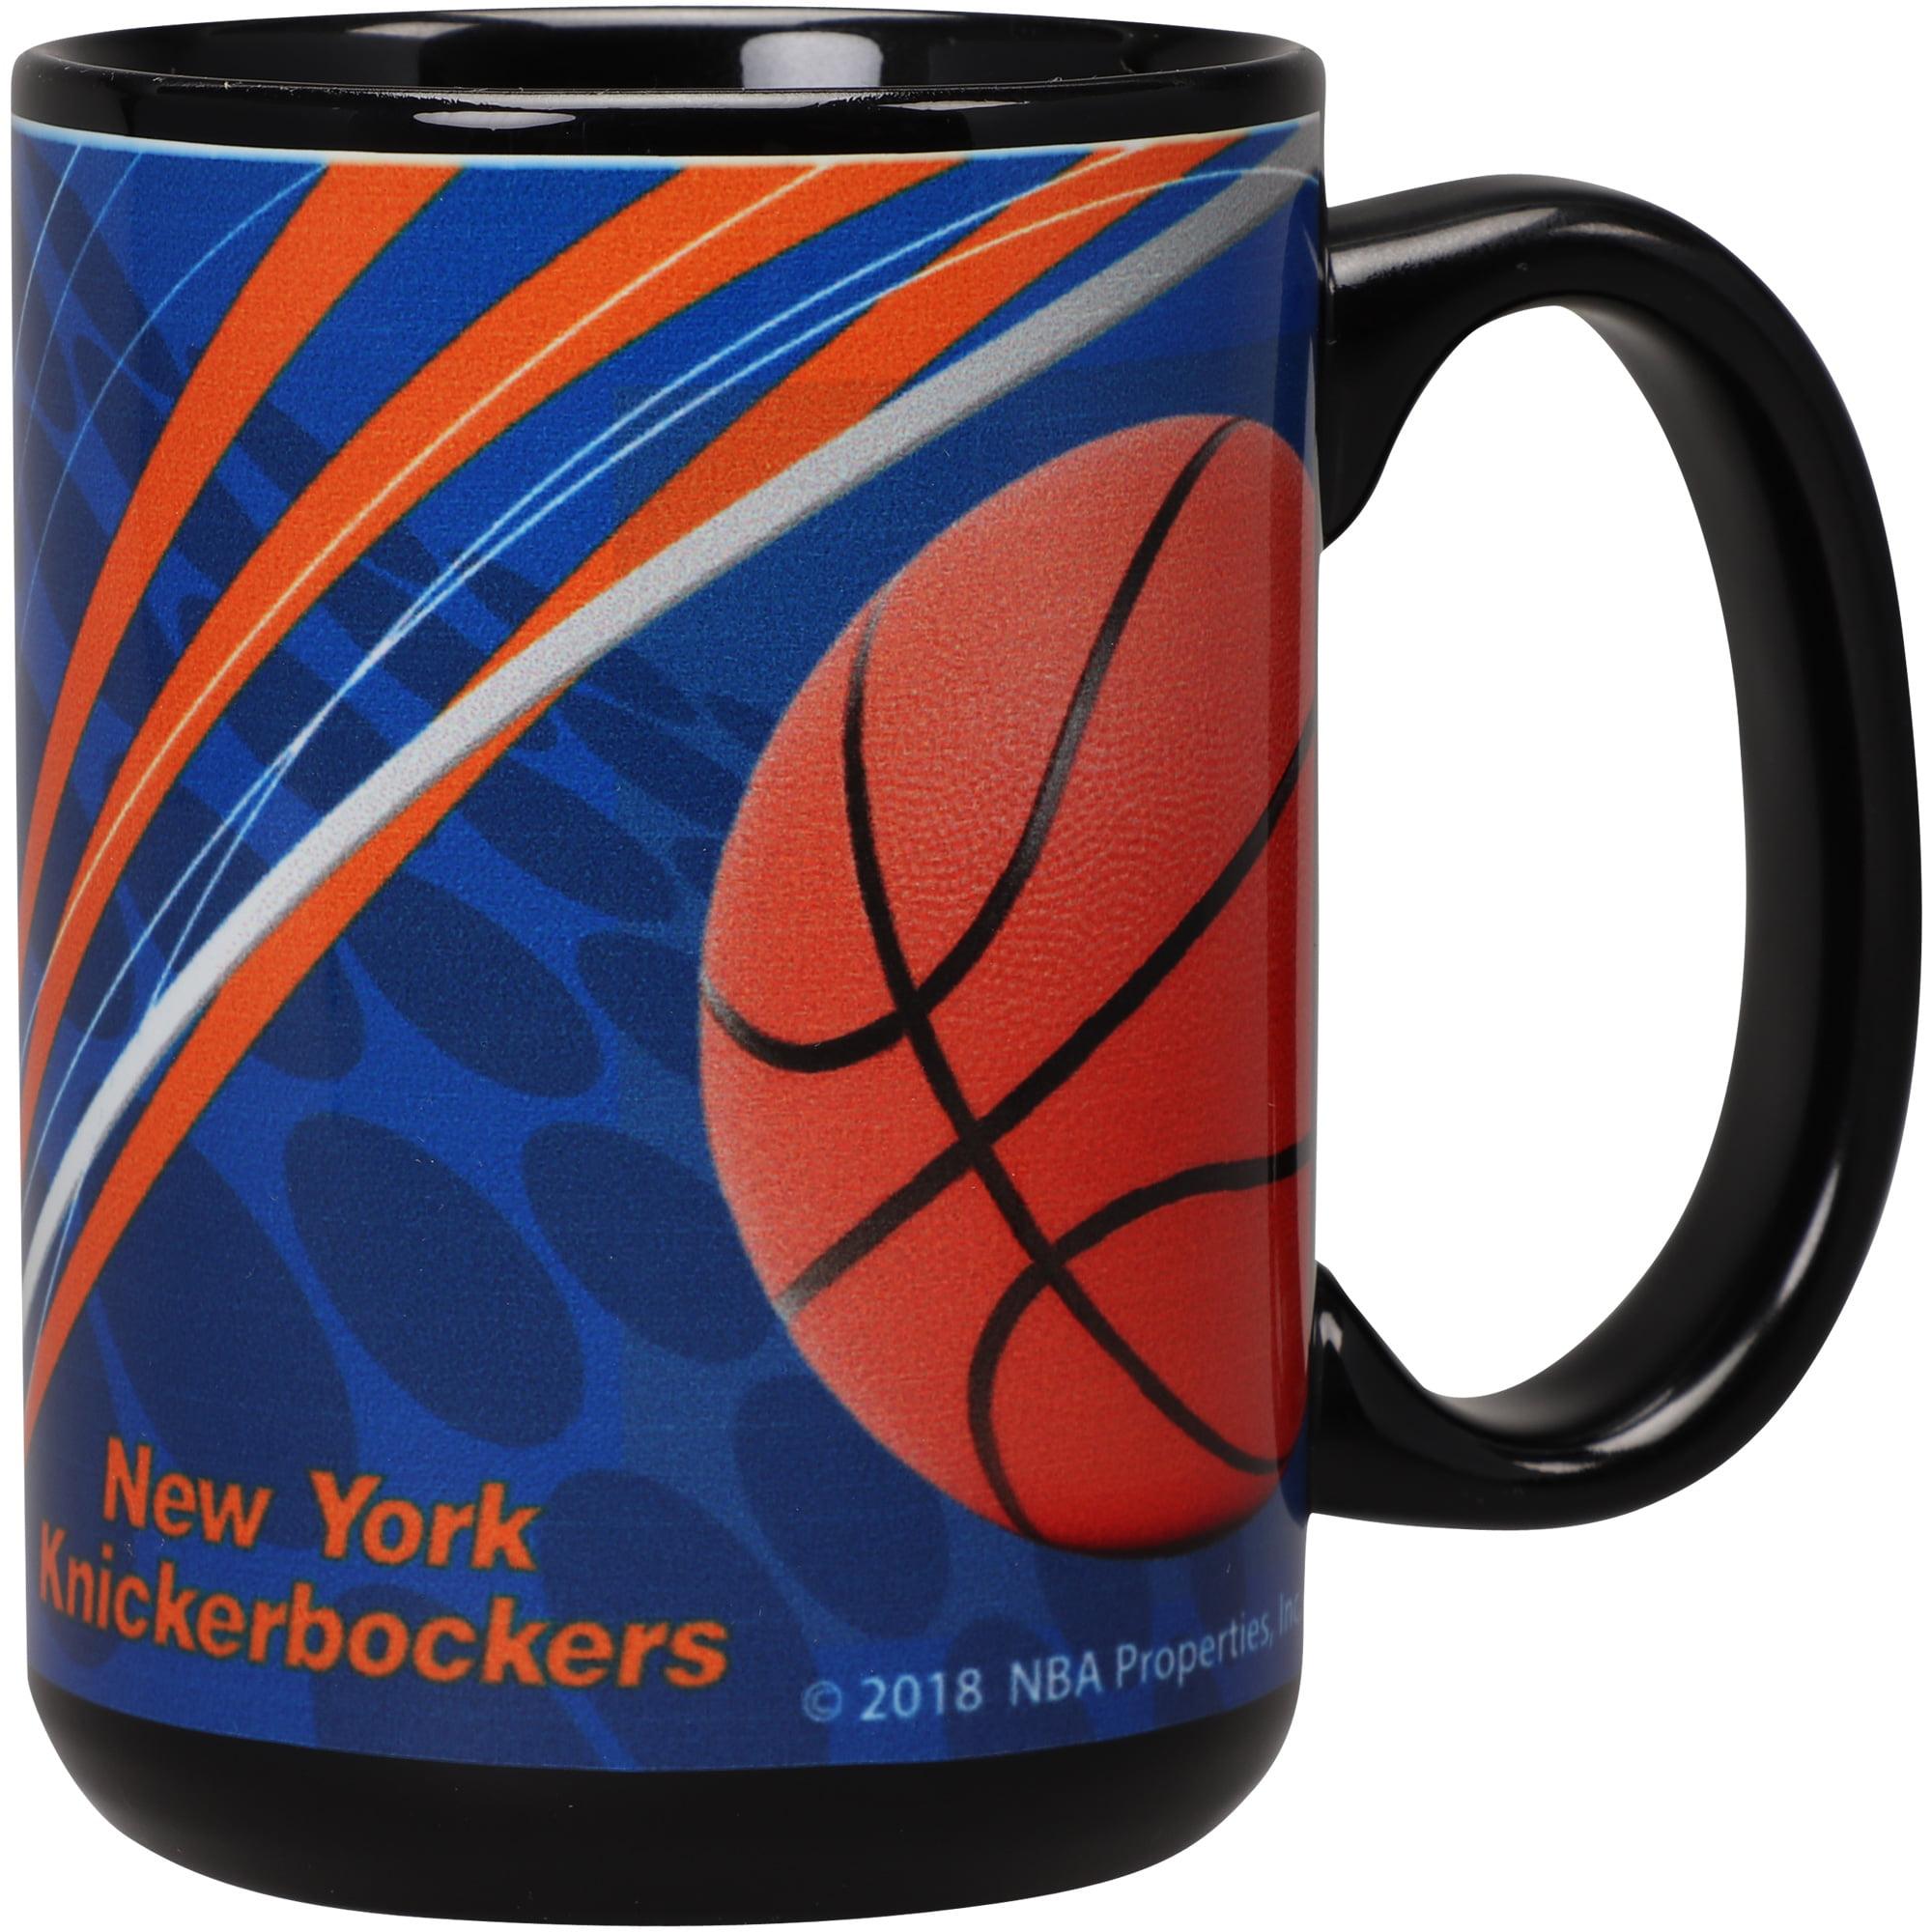 New York Knicks 15oz. Dynamic Mug - No Size